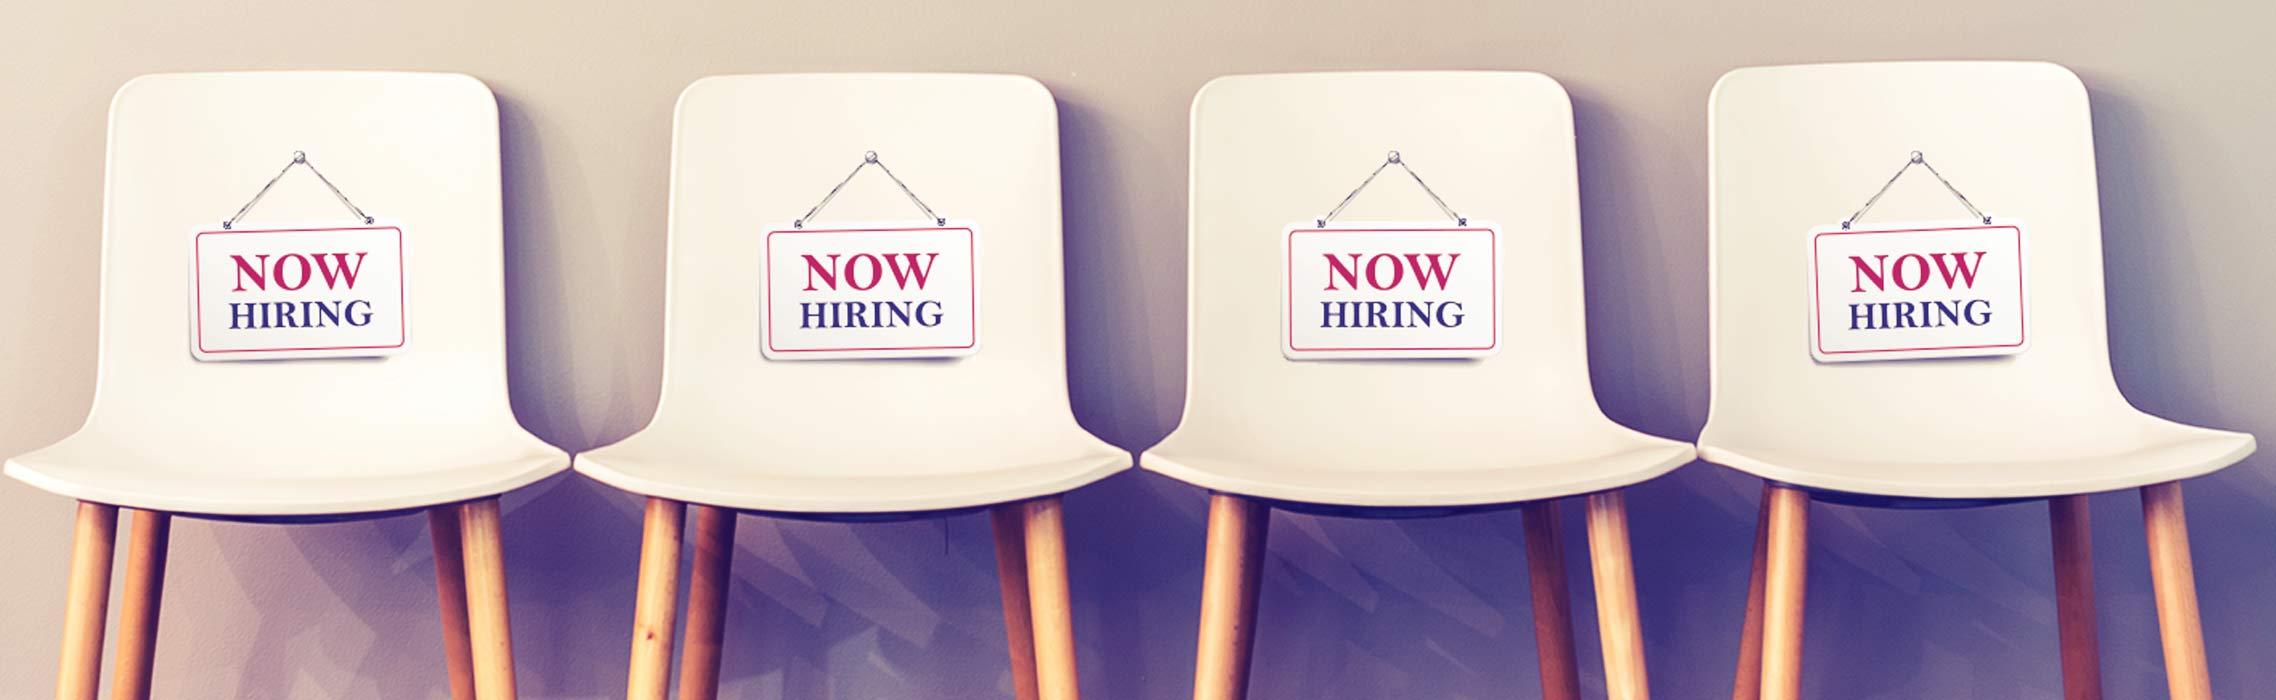 https://www.starfishpeople.com/wp-content/uploads/2019/06/blog-post-header-hiring-employees.jpg